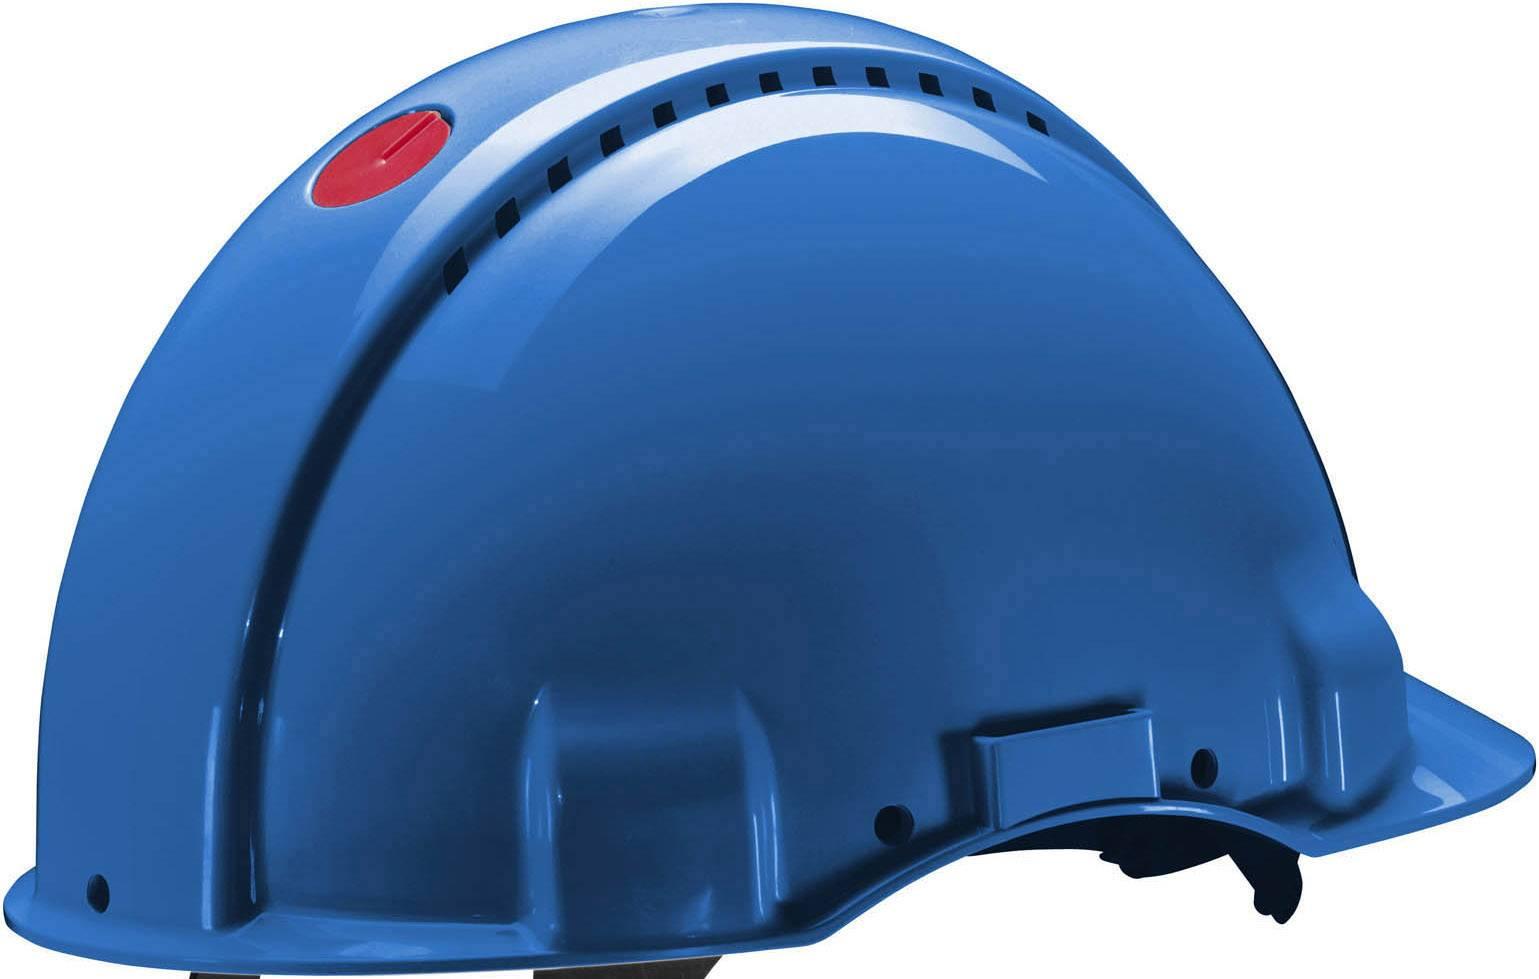 Ochranná přilba 3M Peltor G3000, senzor Uvicator, modrý modrá 7000039719